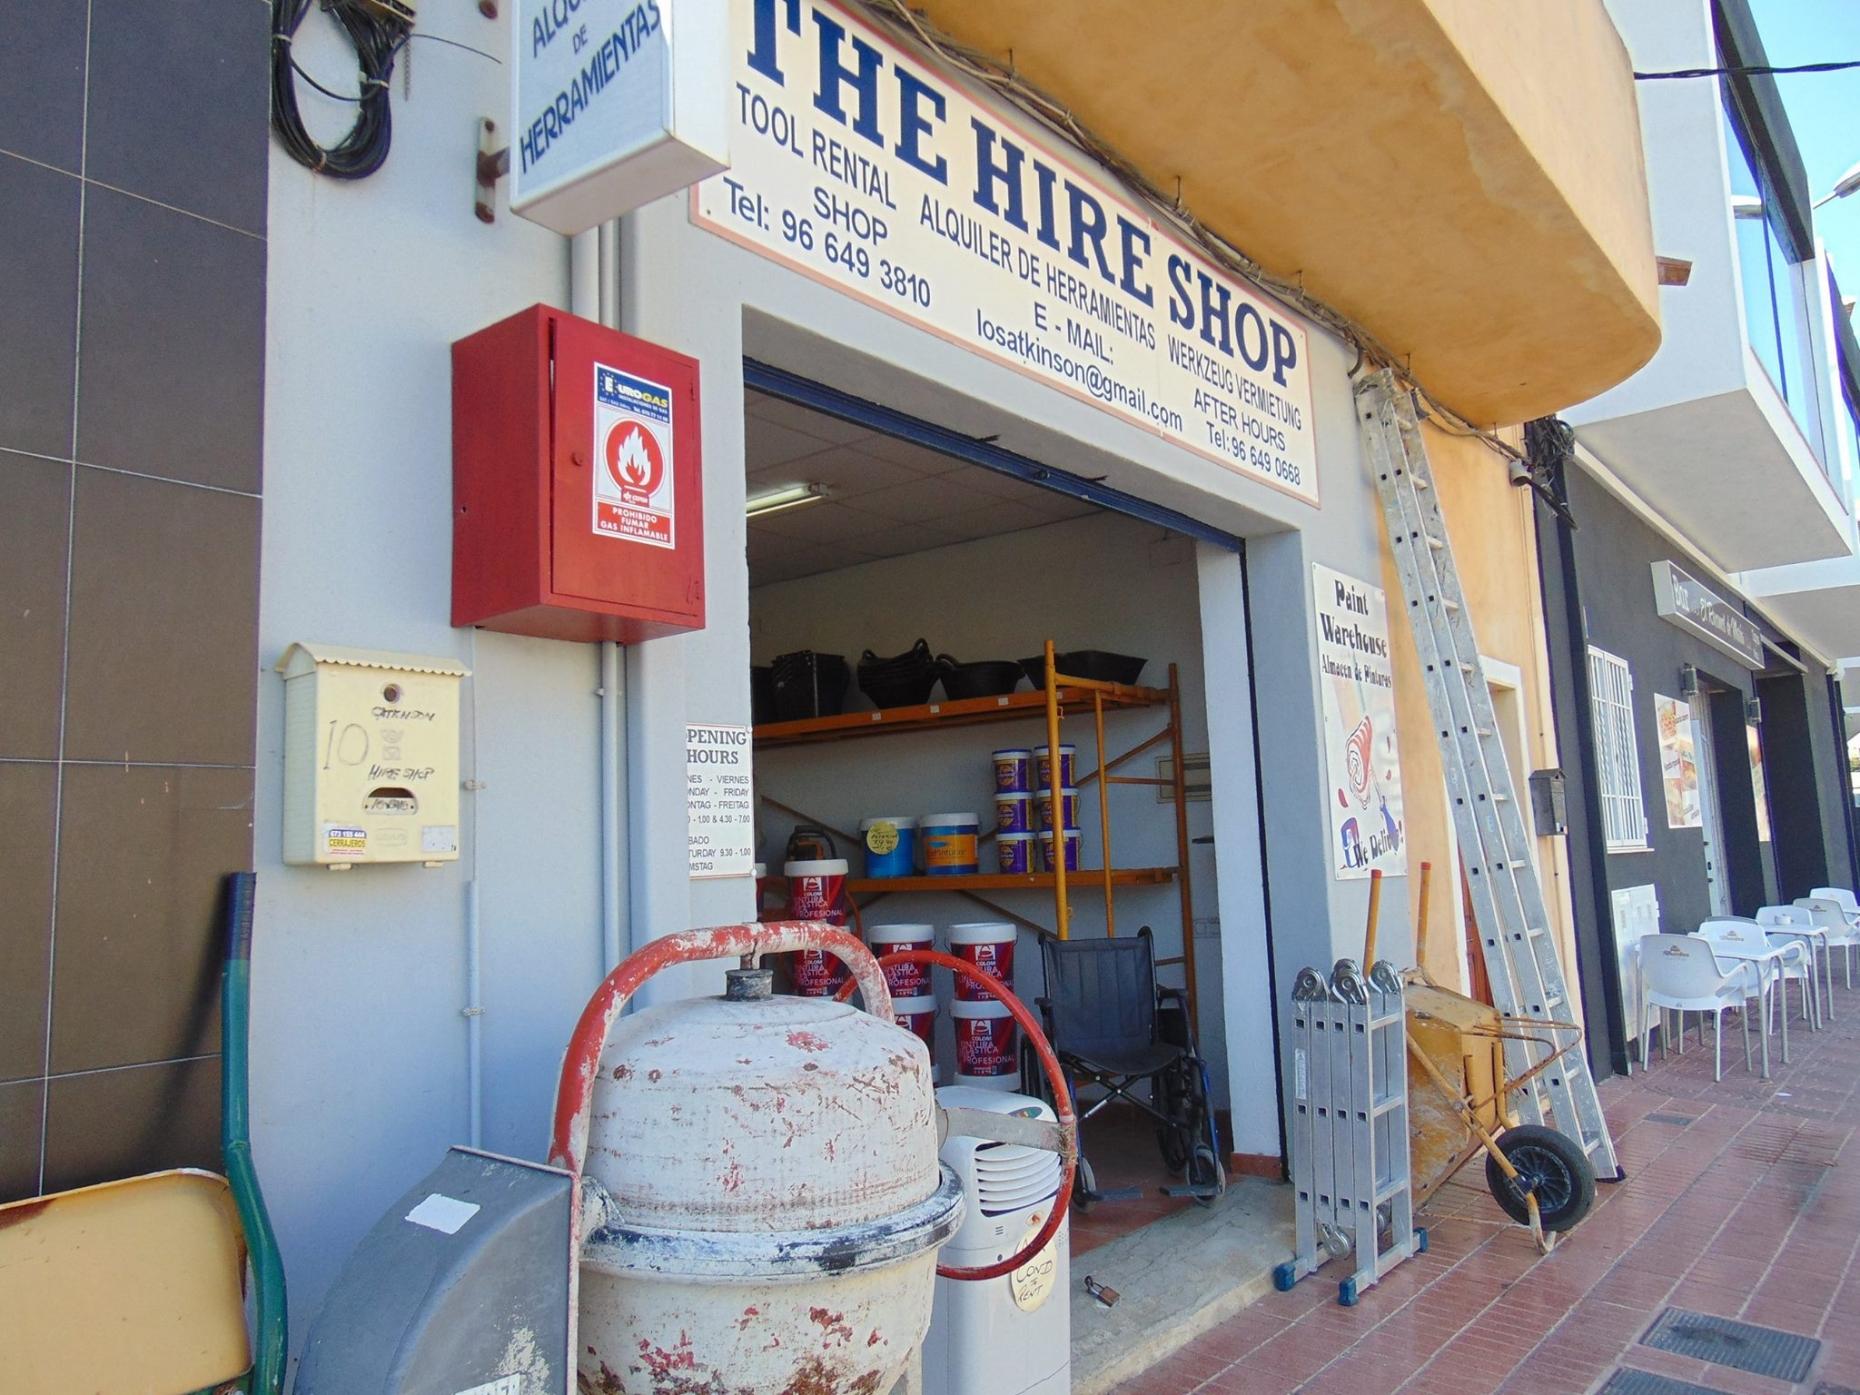 The Hire Shop Benitachell - Tool Hire & Baby Equipment Rental